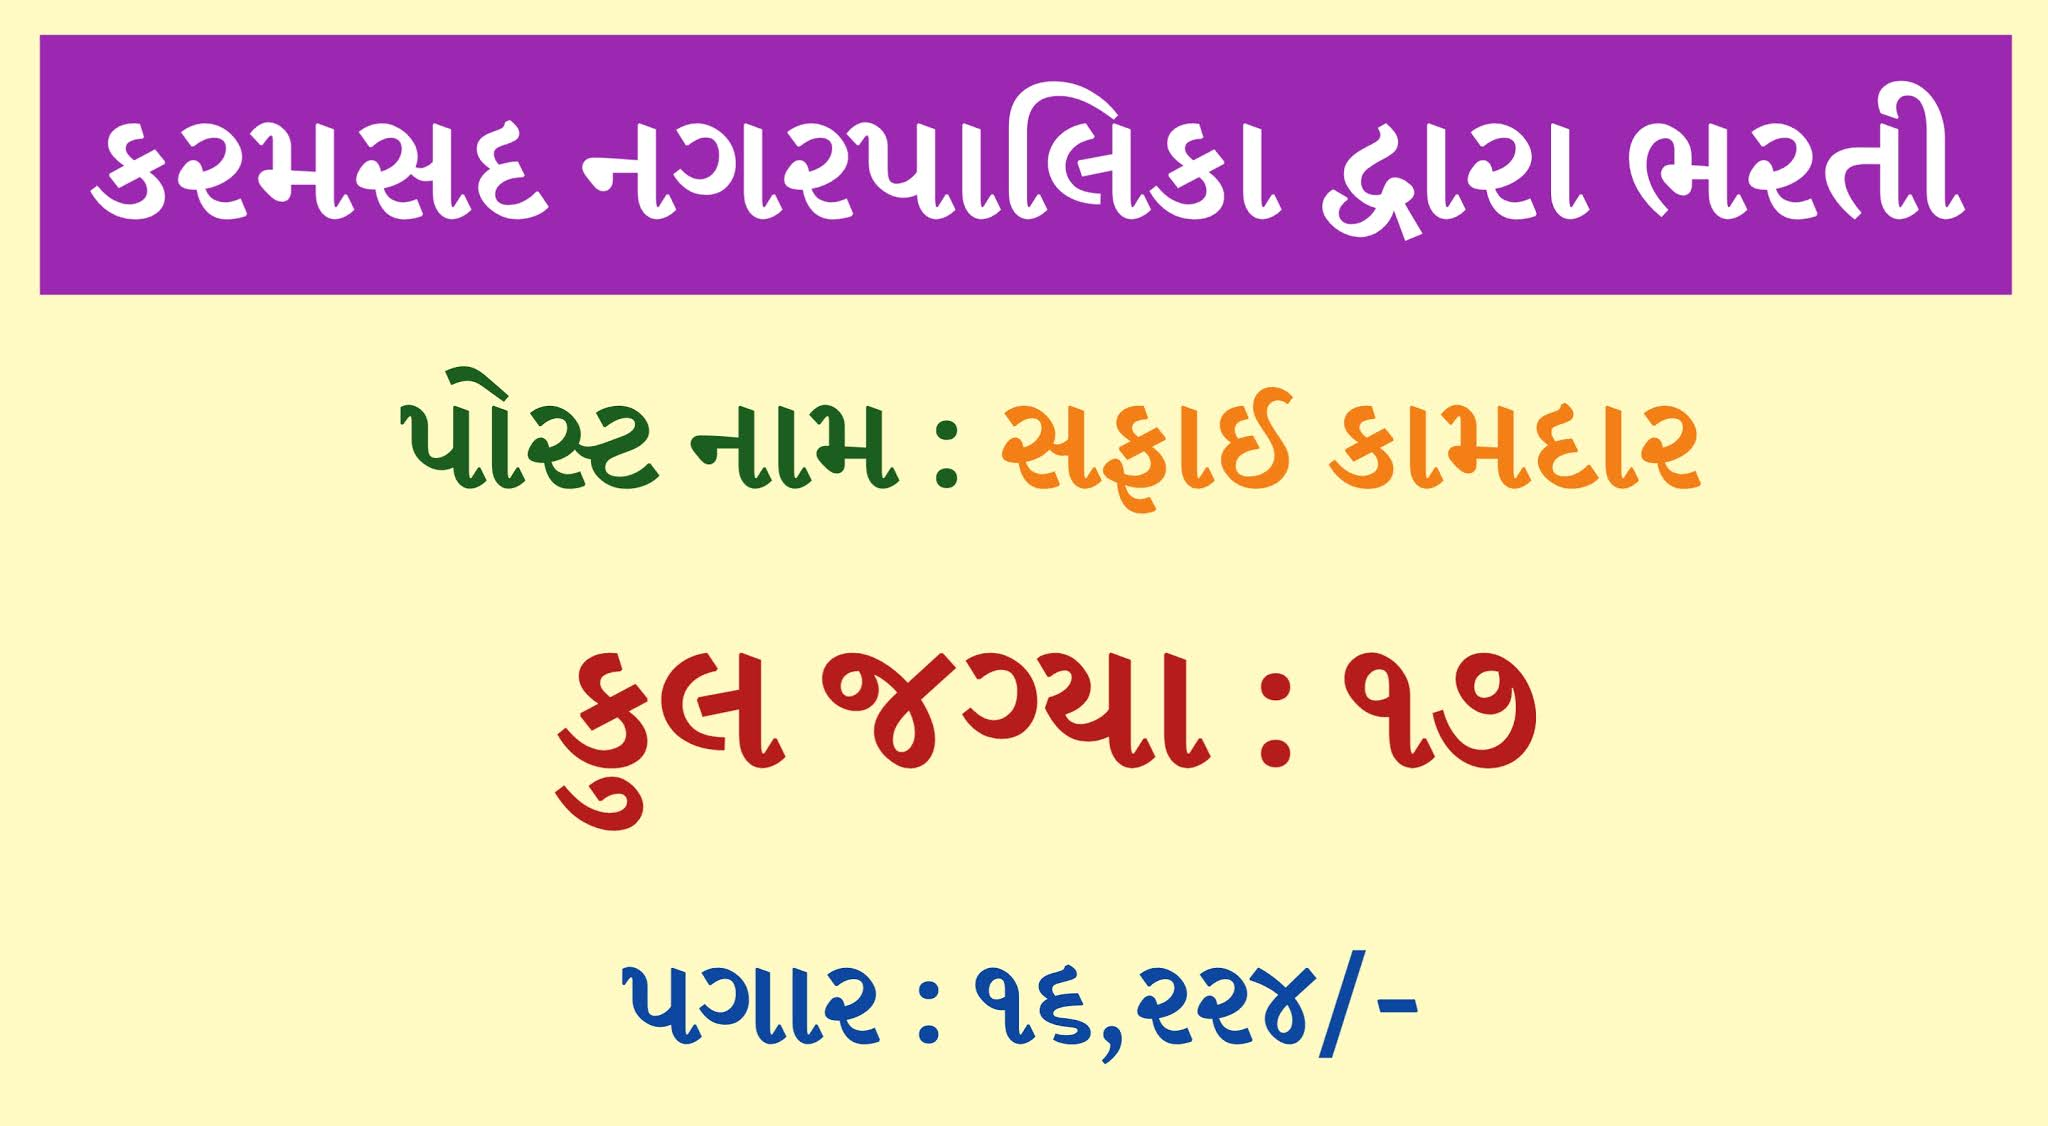 Gujarat Nagarpalika Recruitment 2021 | Karamsad Nagarpalika Safai Kamdar Post 2021 | Karamsad Nagarpalika Safai Kamdar Recruitment 2021 | Nagarpalika Safai Kamdar Recruitment 2021 | Nagarpalika Recruitment 2021 | Safai Kamdar Recruitment 2021